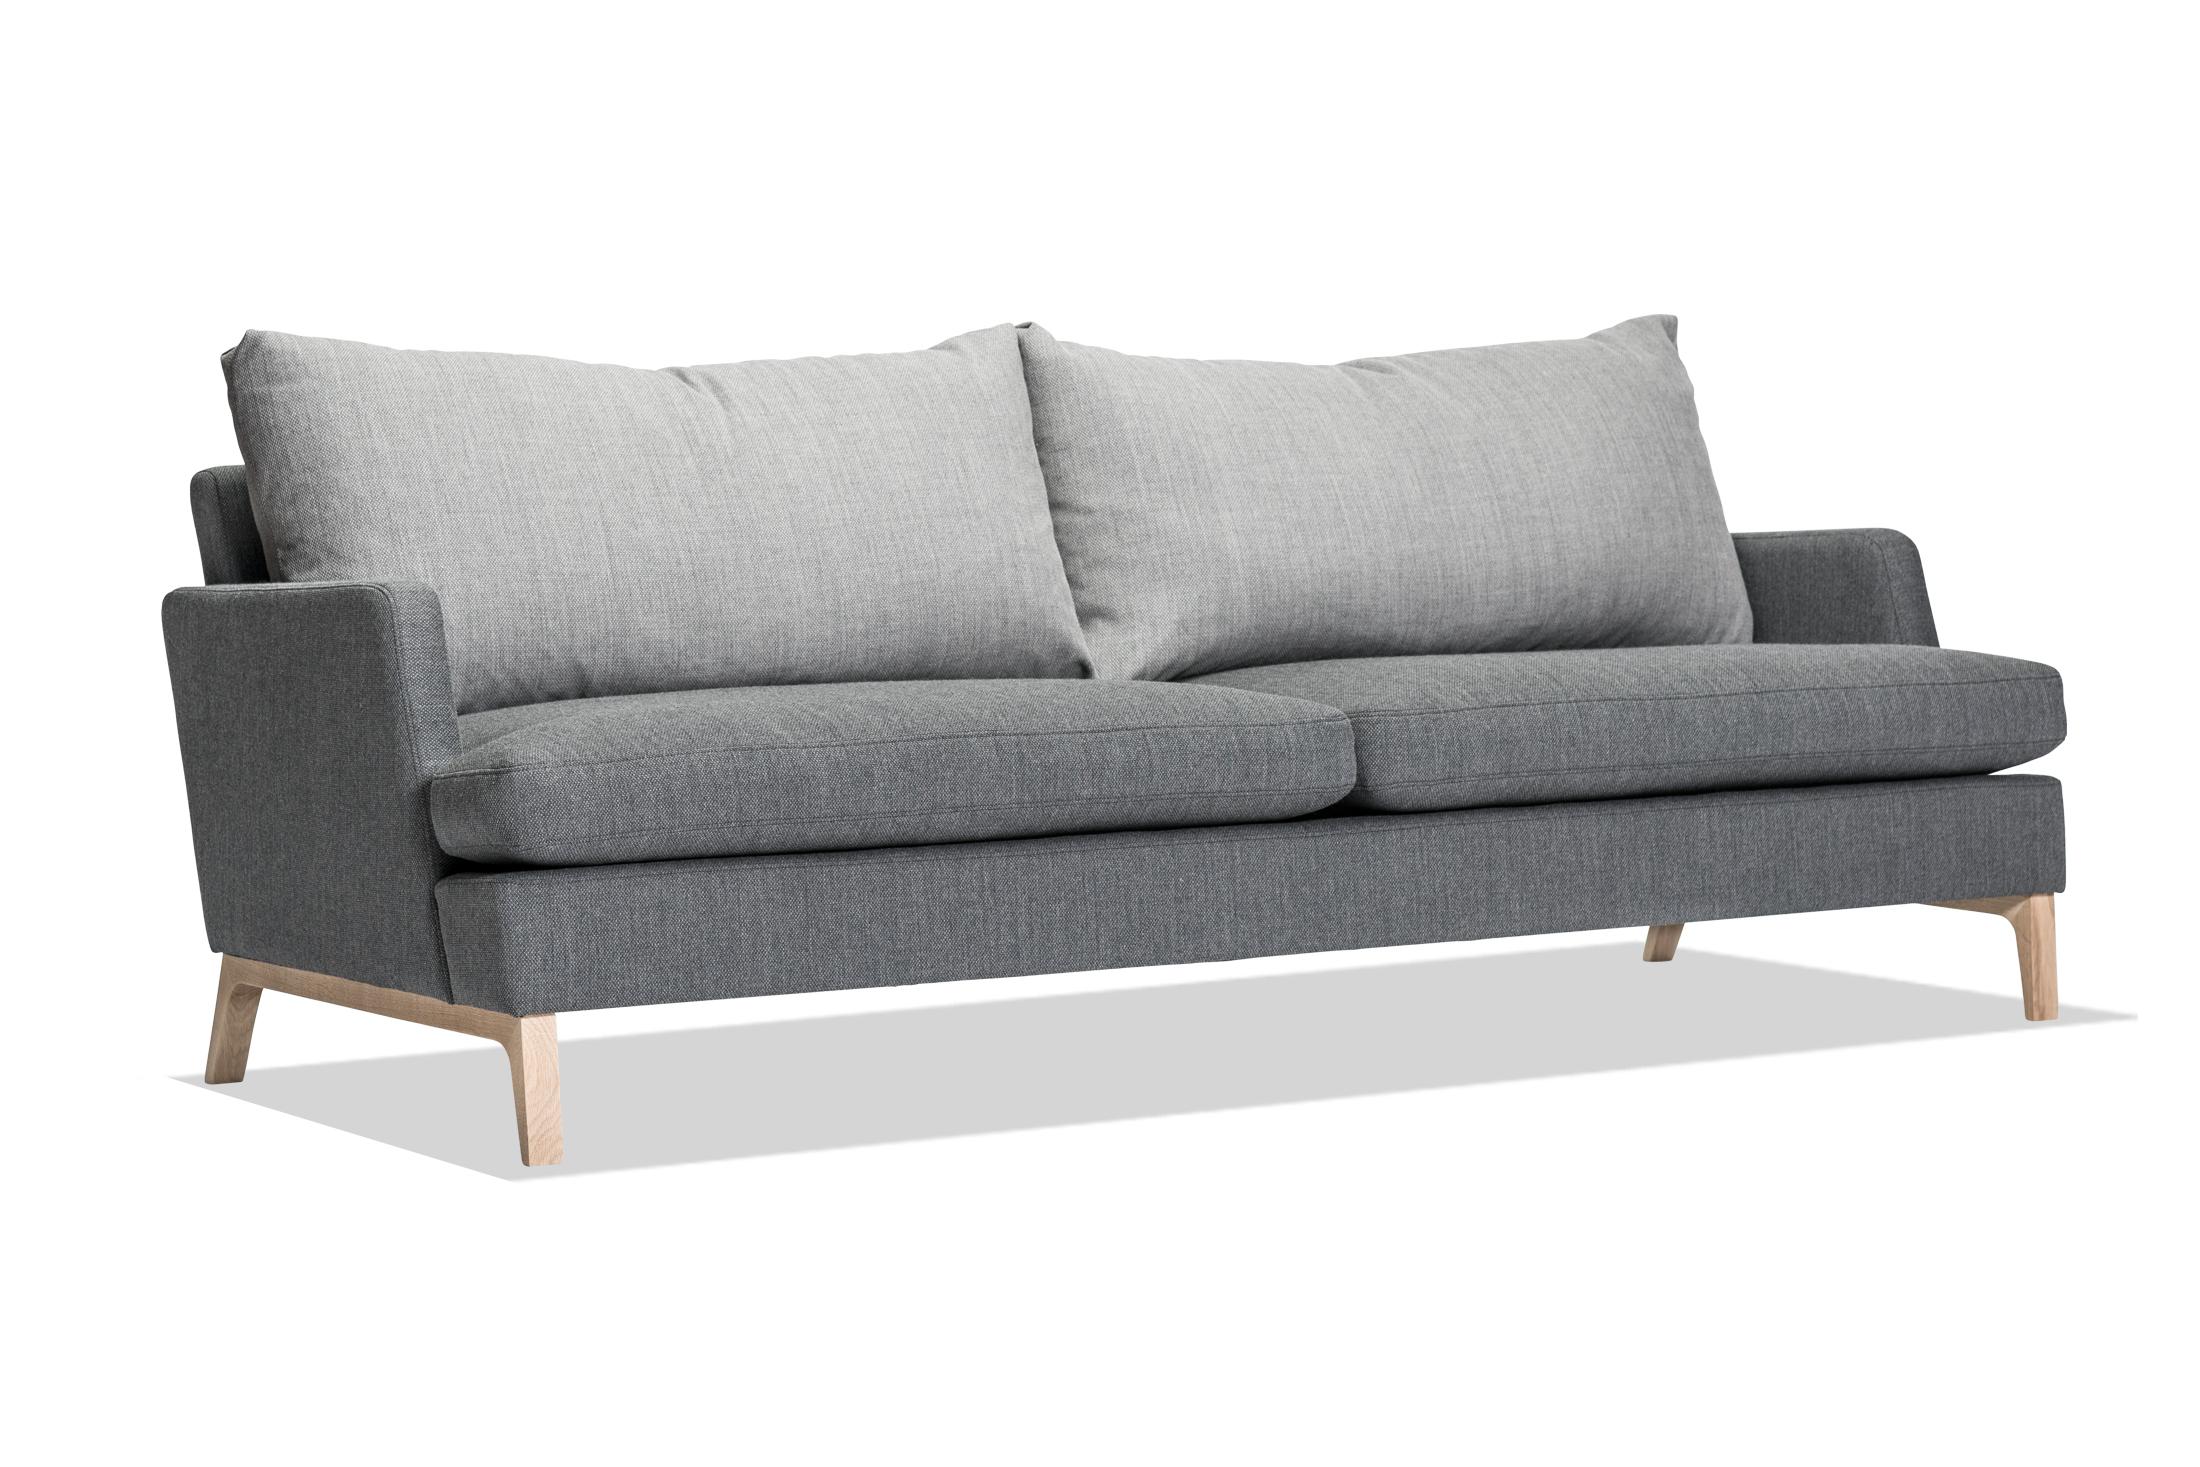 morteens sofa finest glamour wardrobe chest with morteens sofa fabulous morteens kaufen with. Black Bedroom Furniture Sets. Home Design Ideas